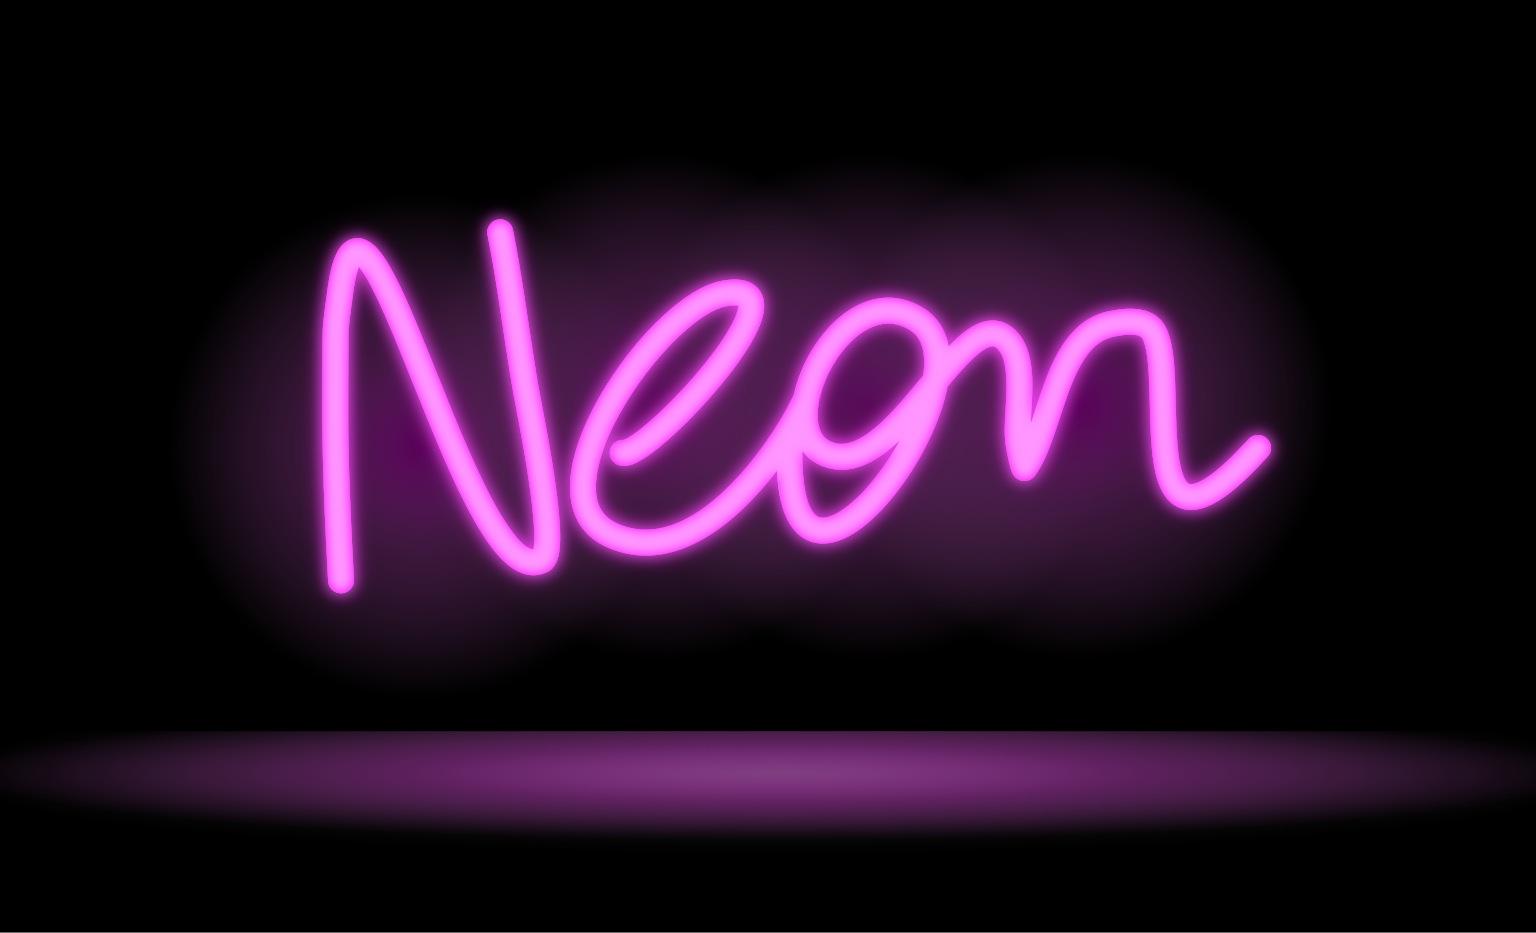 DigitalDrawer: Drawing a Neon Sign in Inkpad